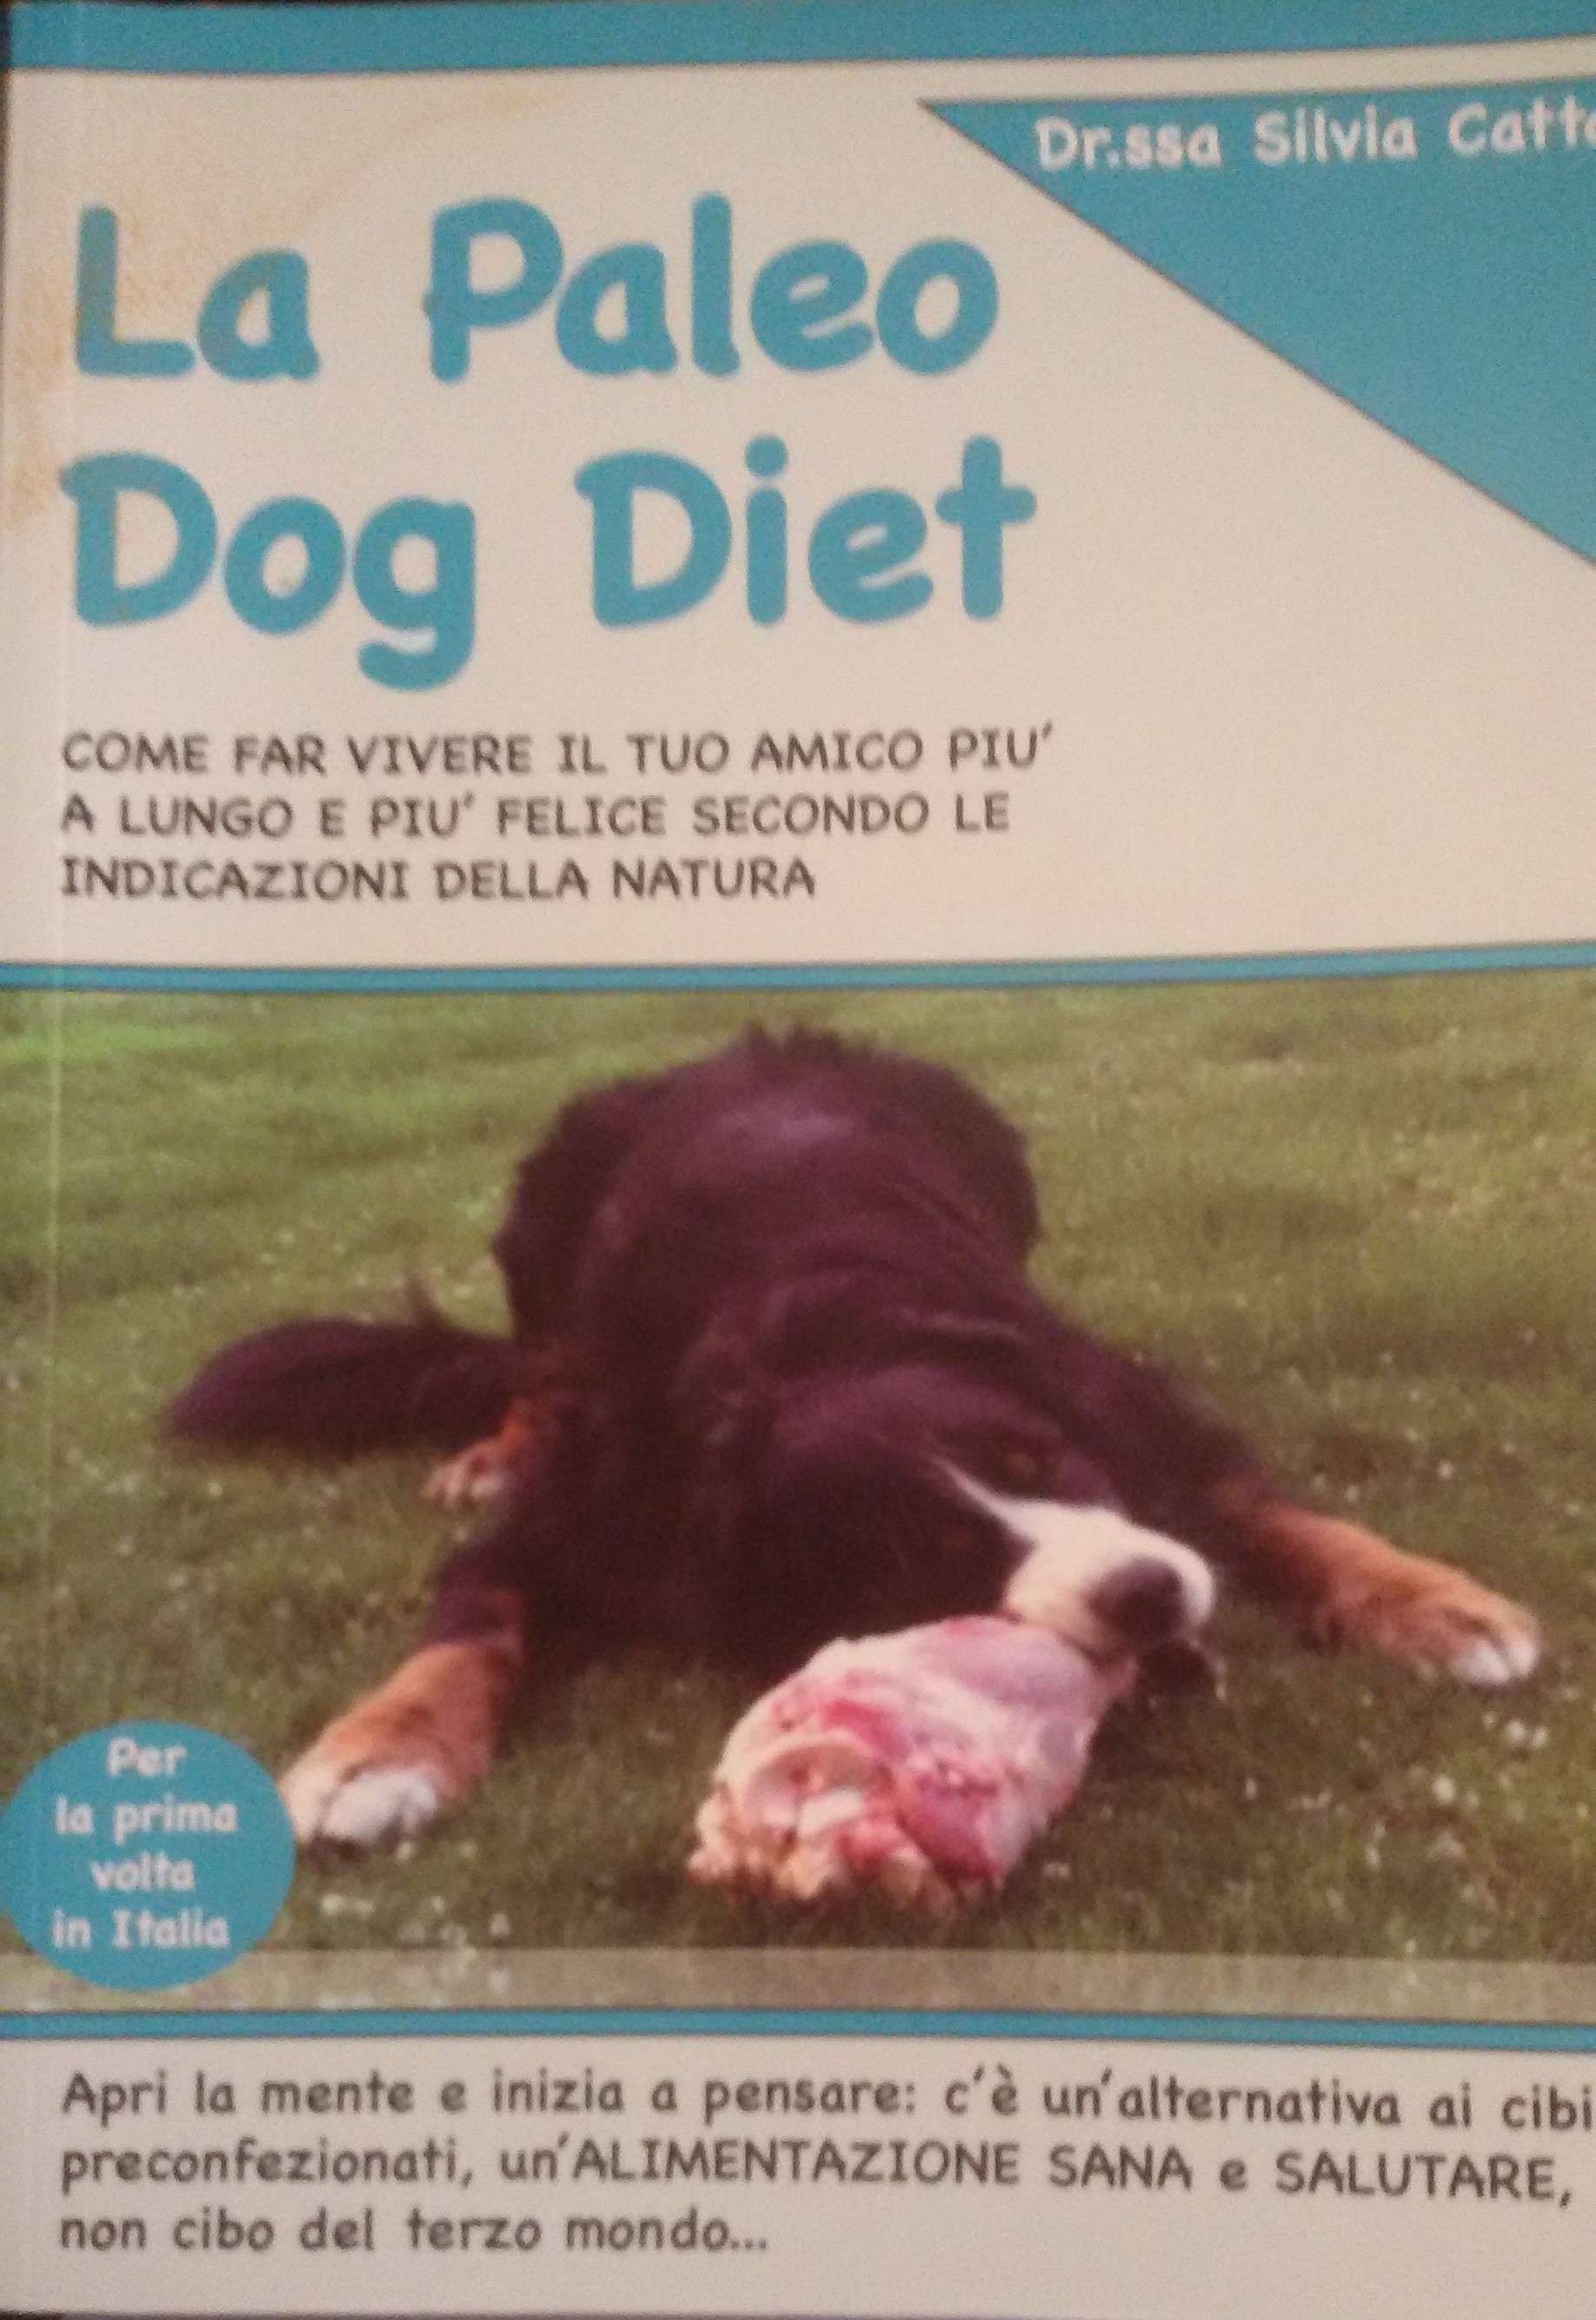 La paleo dog diet